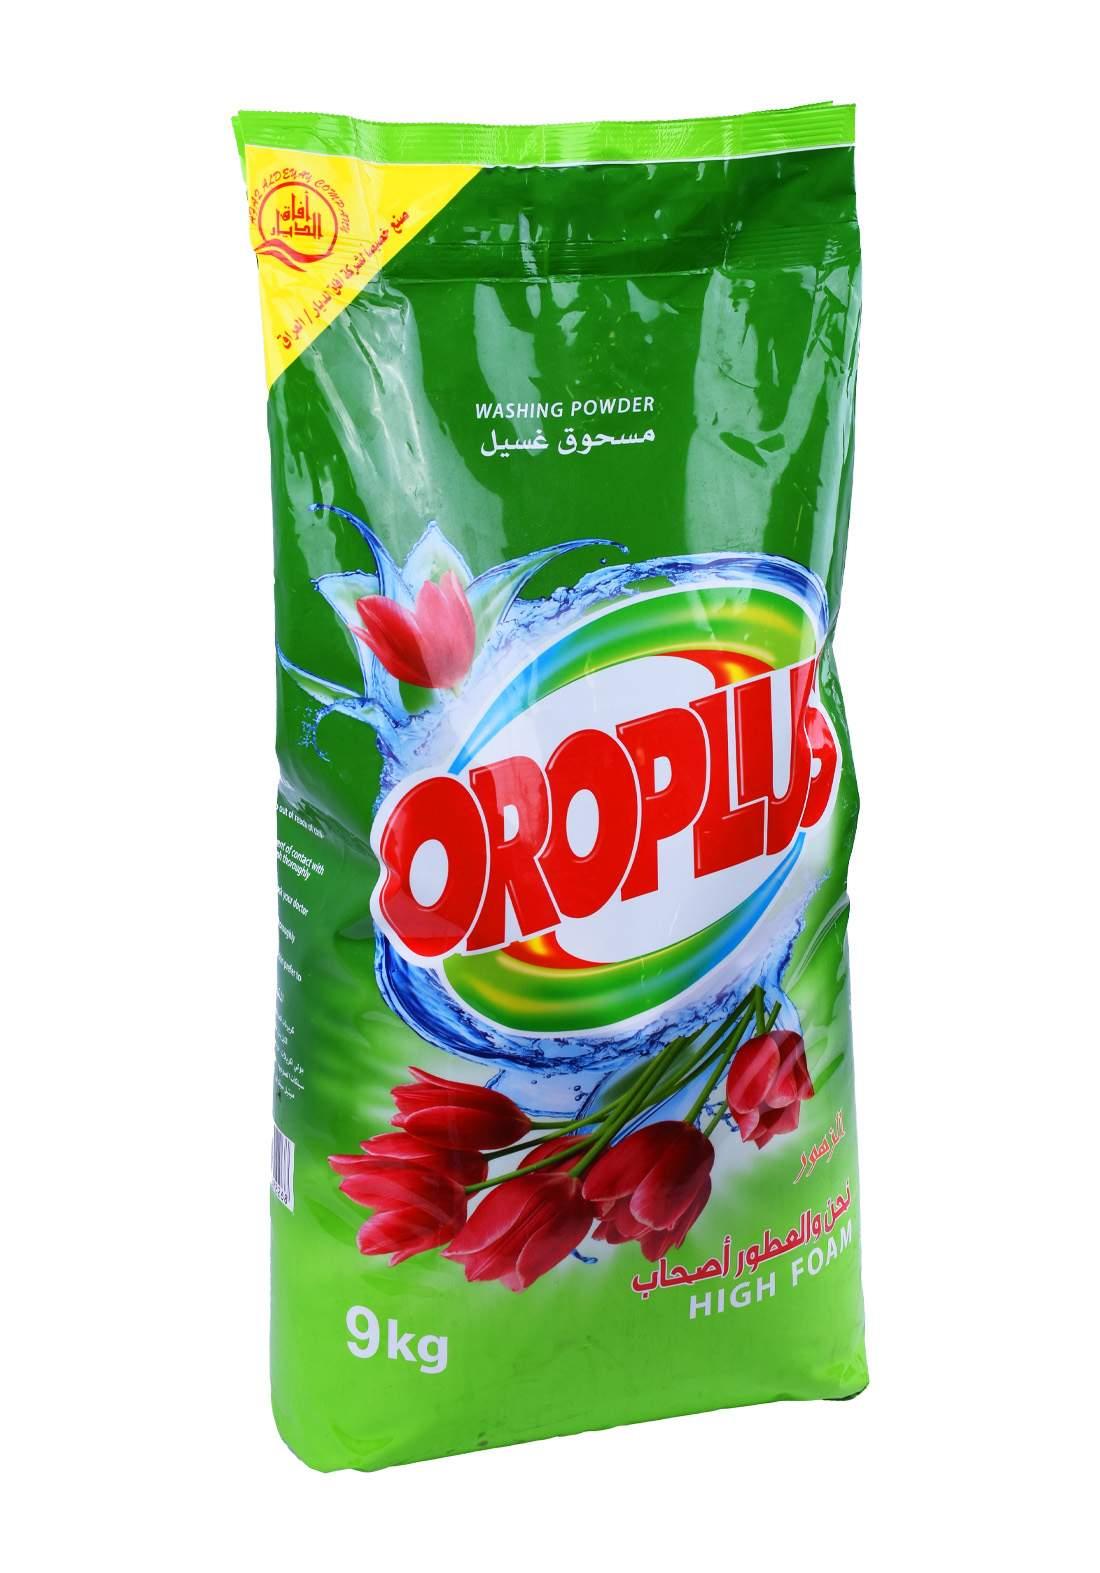 Oroplus Washing Powder Flowers  9 Kg    مسحوق غسيل الملابس للغسالات العادية